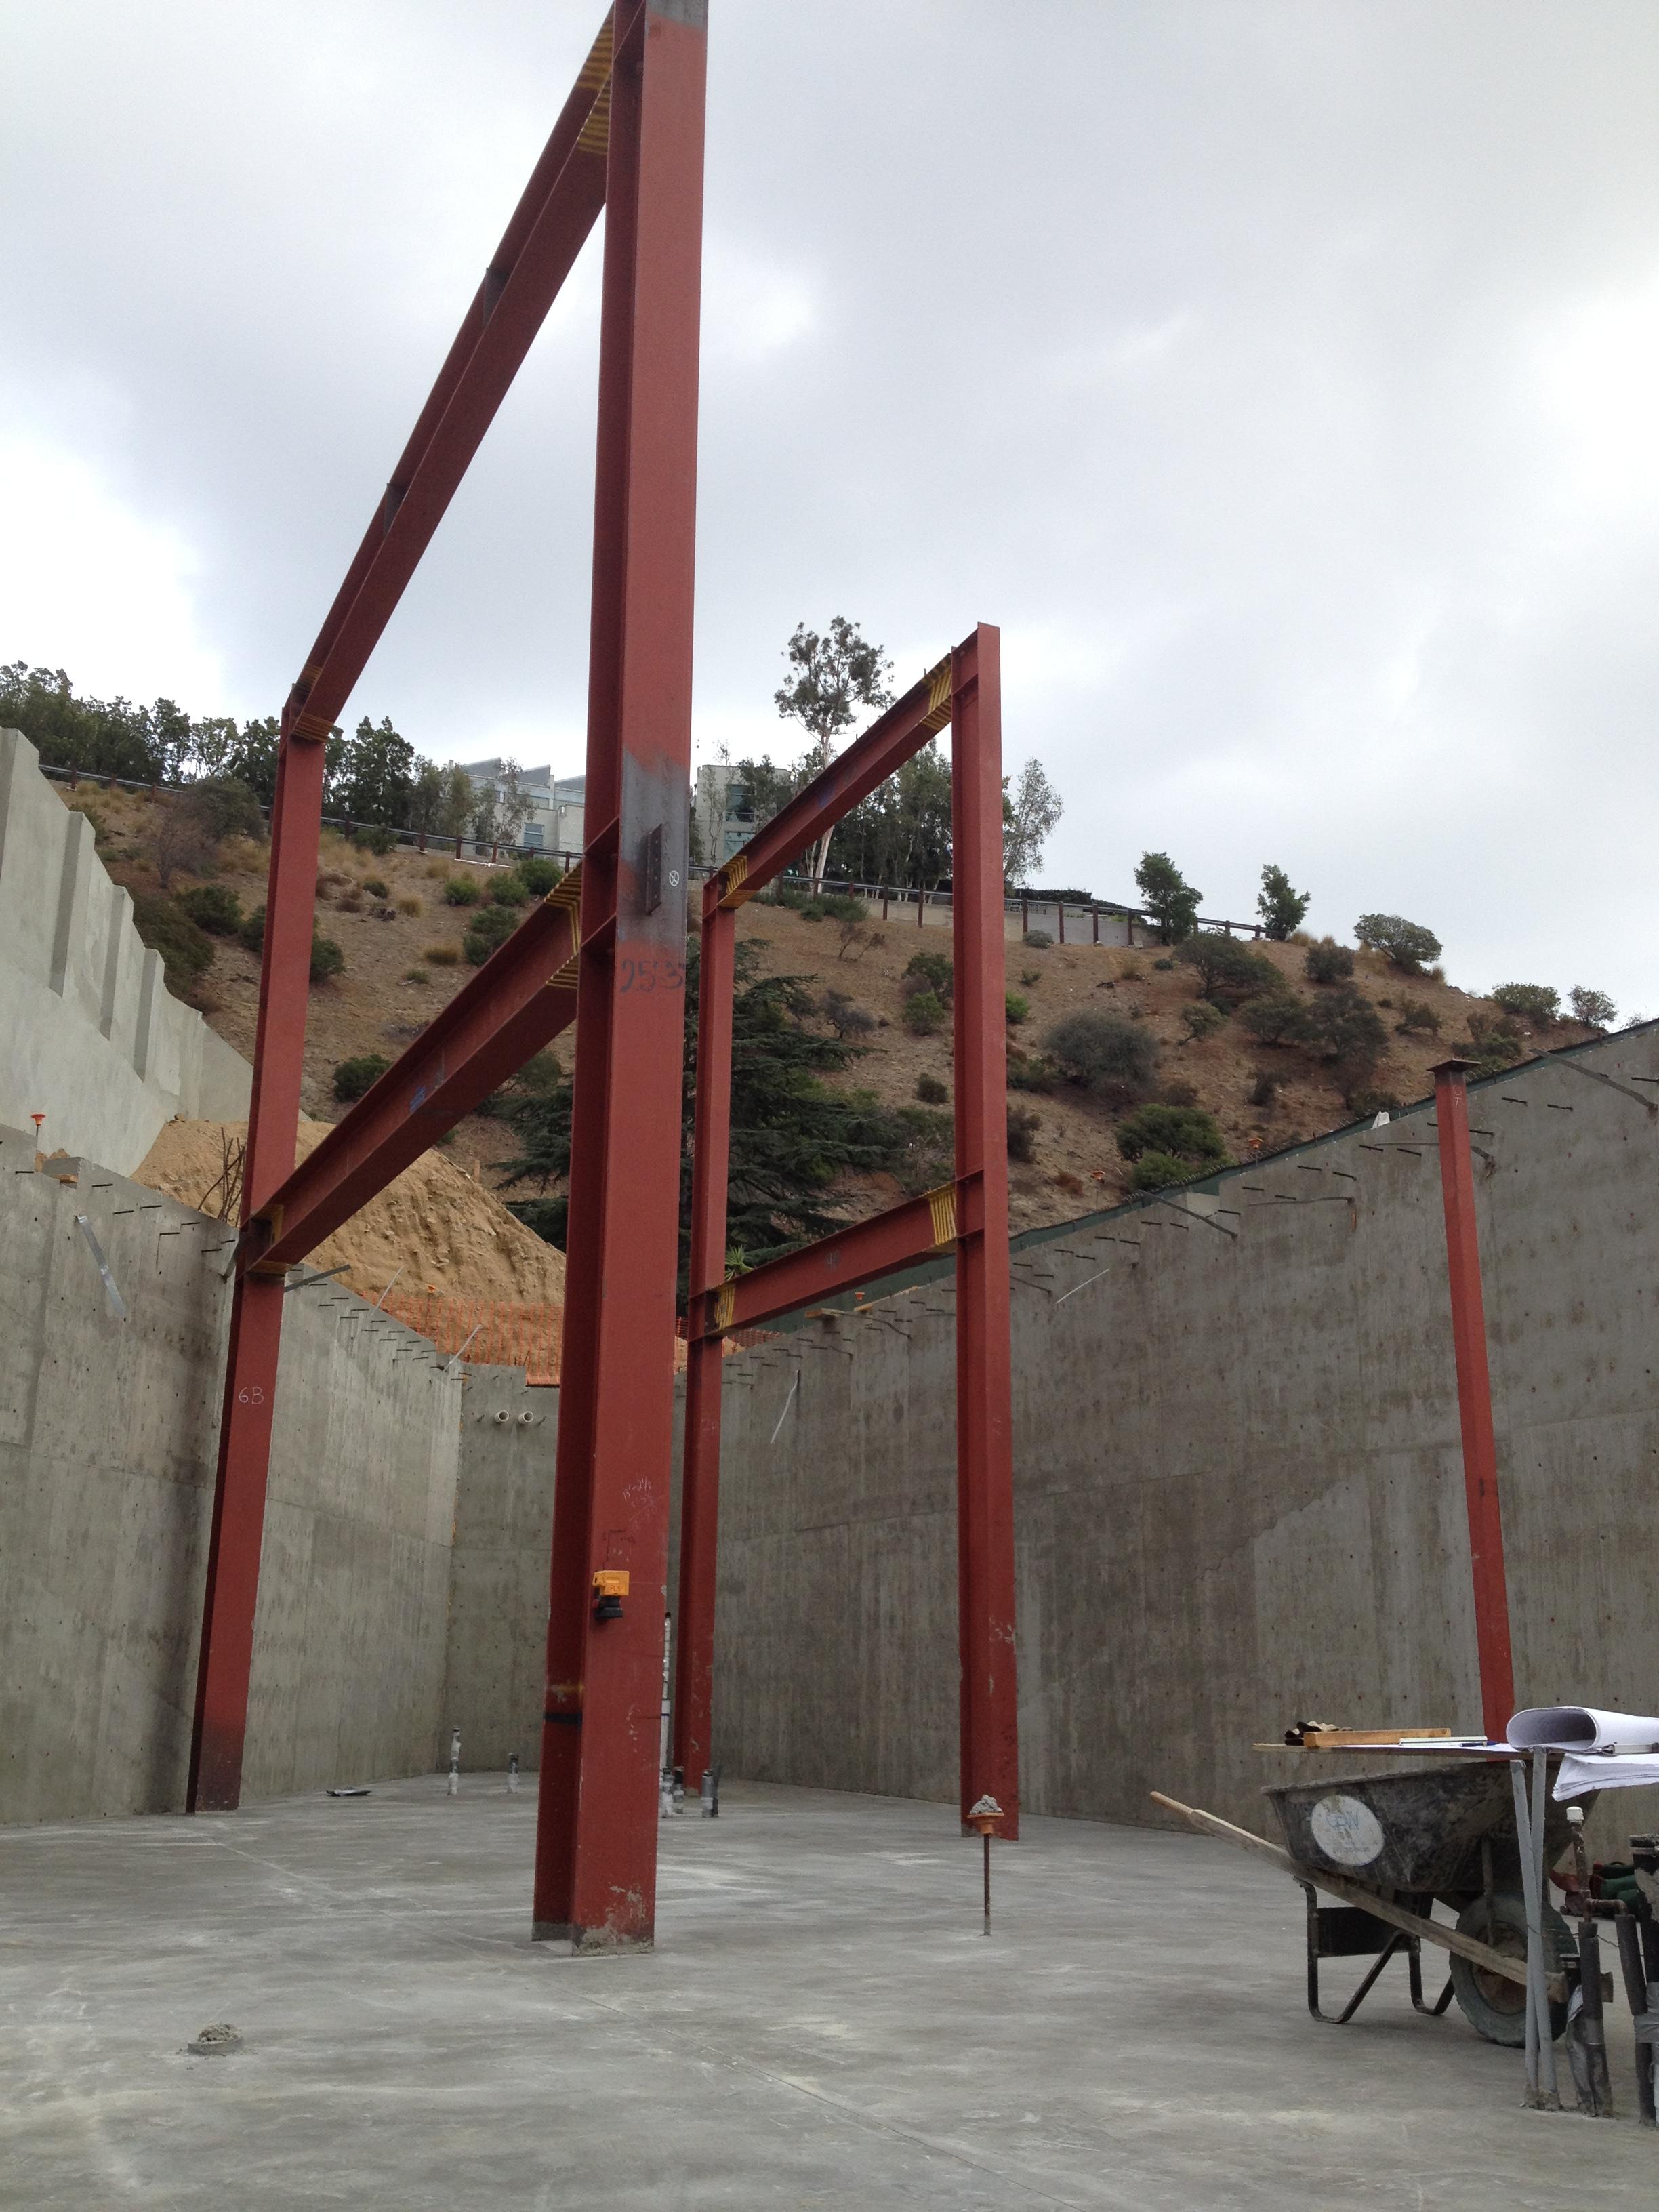 anderson welding inglewood california proview beverly hills 2 anderson welding